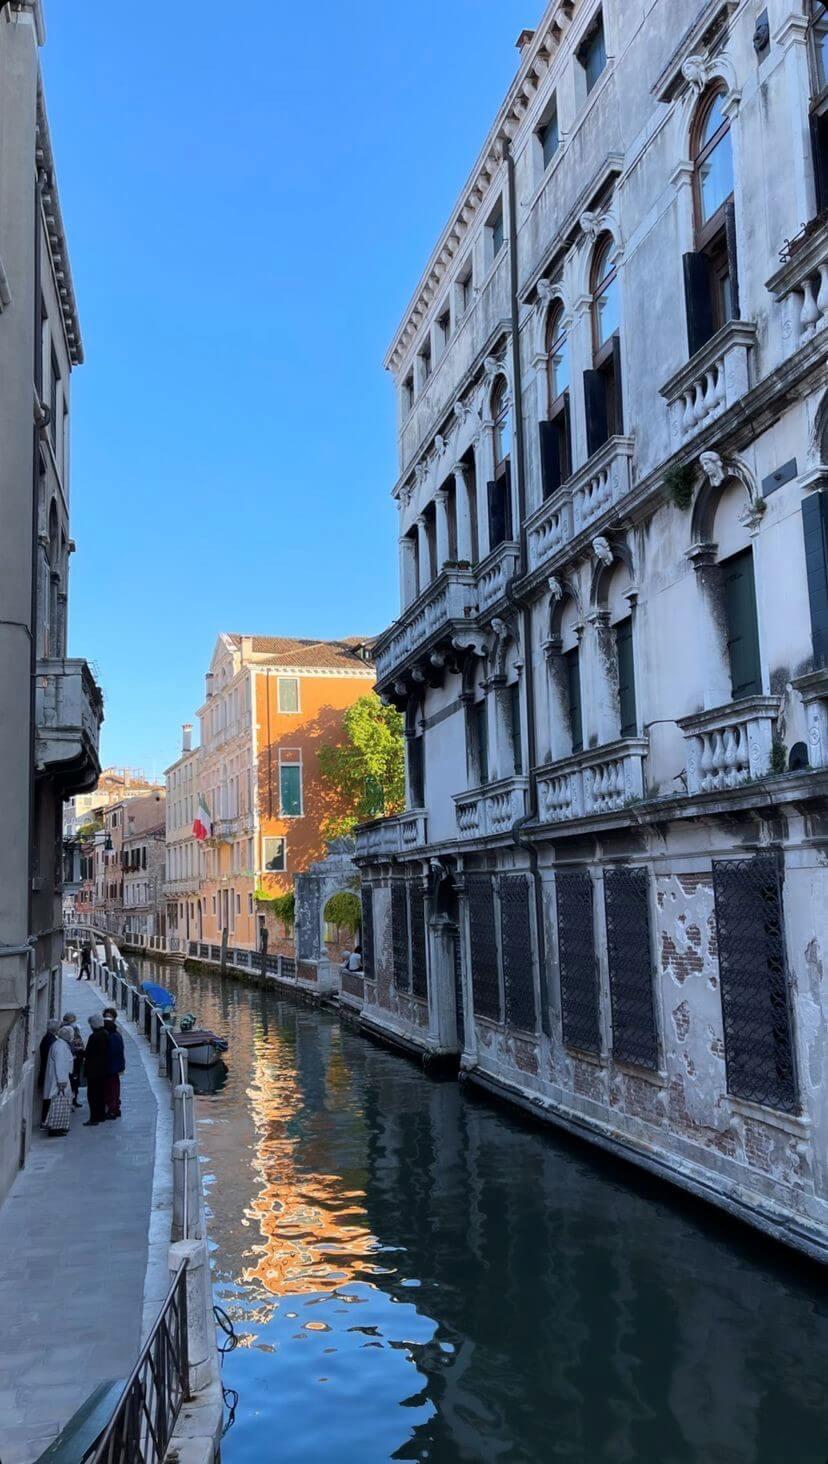 Venedig, Venice, Reiseblog, Travelblog, München, Katefully, Modeblog, Fashionblog, Munich, Italy, Italien, Gondeln, Bella Italia, Instagram, Reisetipps